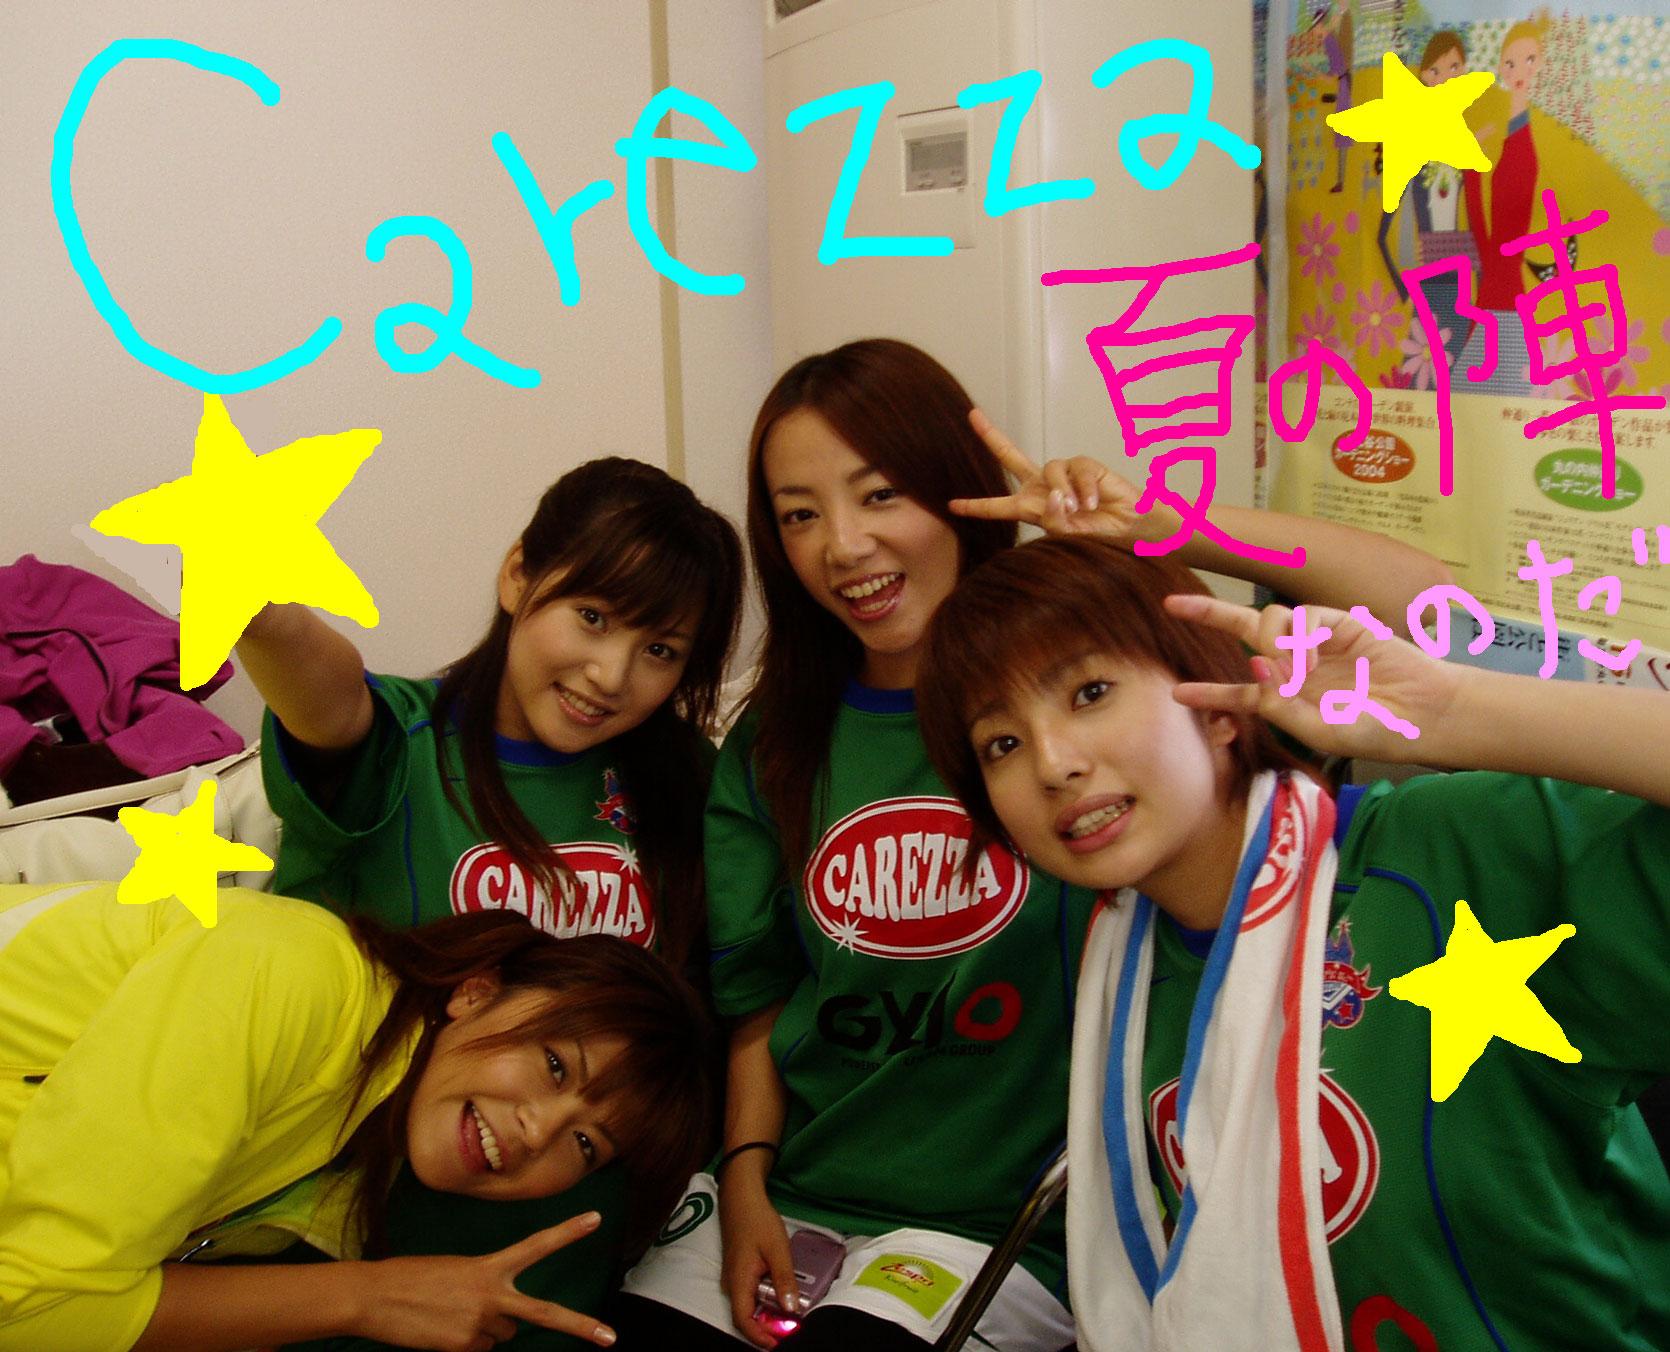 carezza の夏☆_c0038100_15295732.jpg